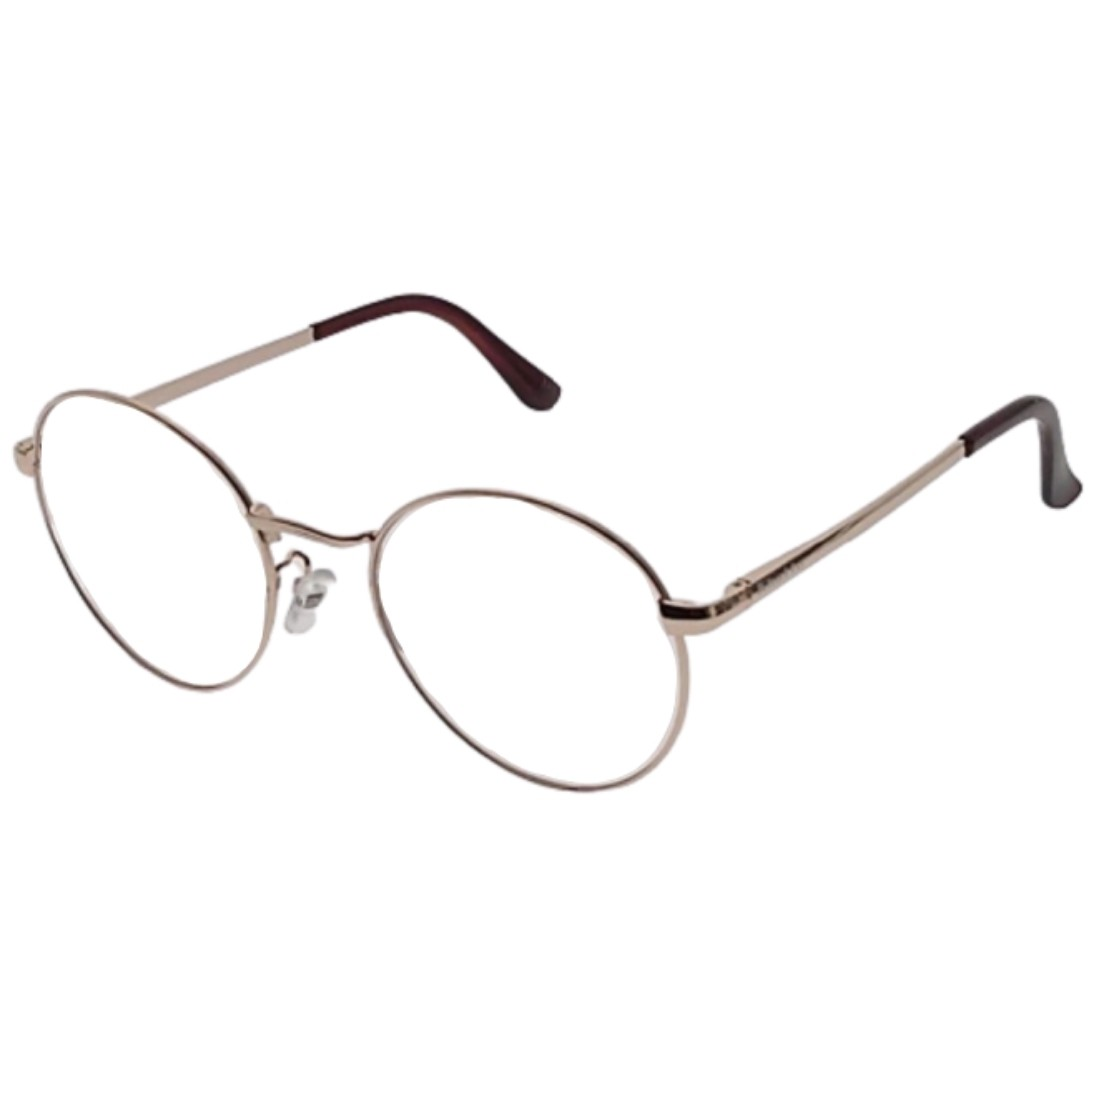 Armação para Óculos Khatto Round Vintage - C143